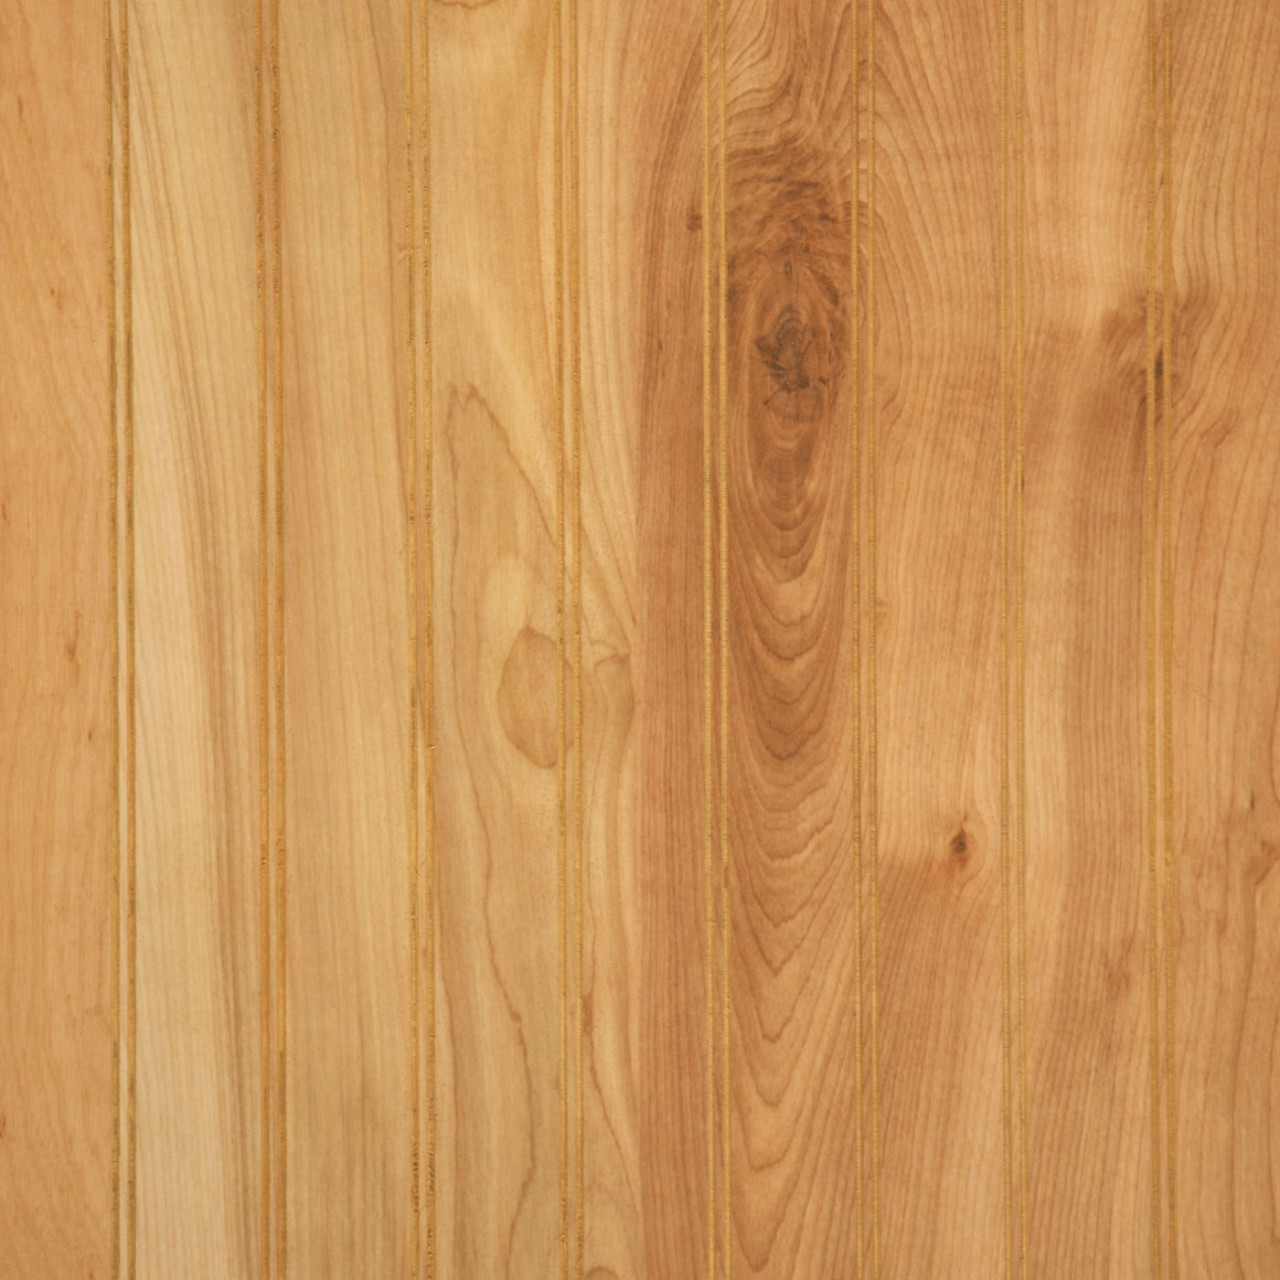 Beadboard Wainscot Paneling Natural Birch Wall Paneling